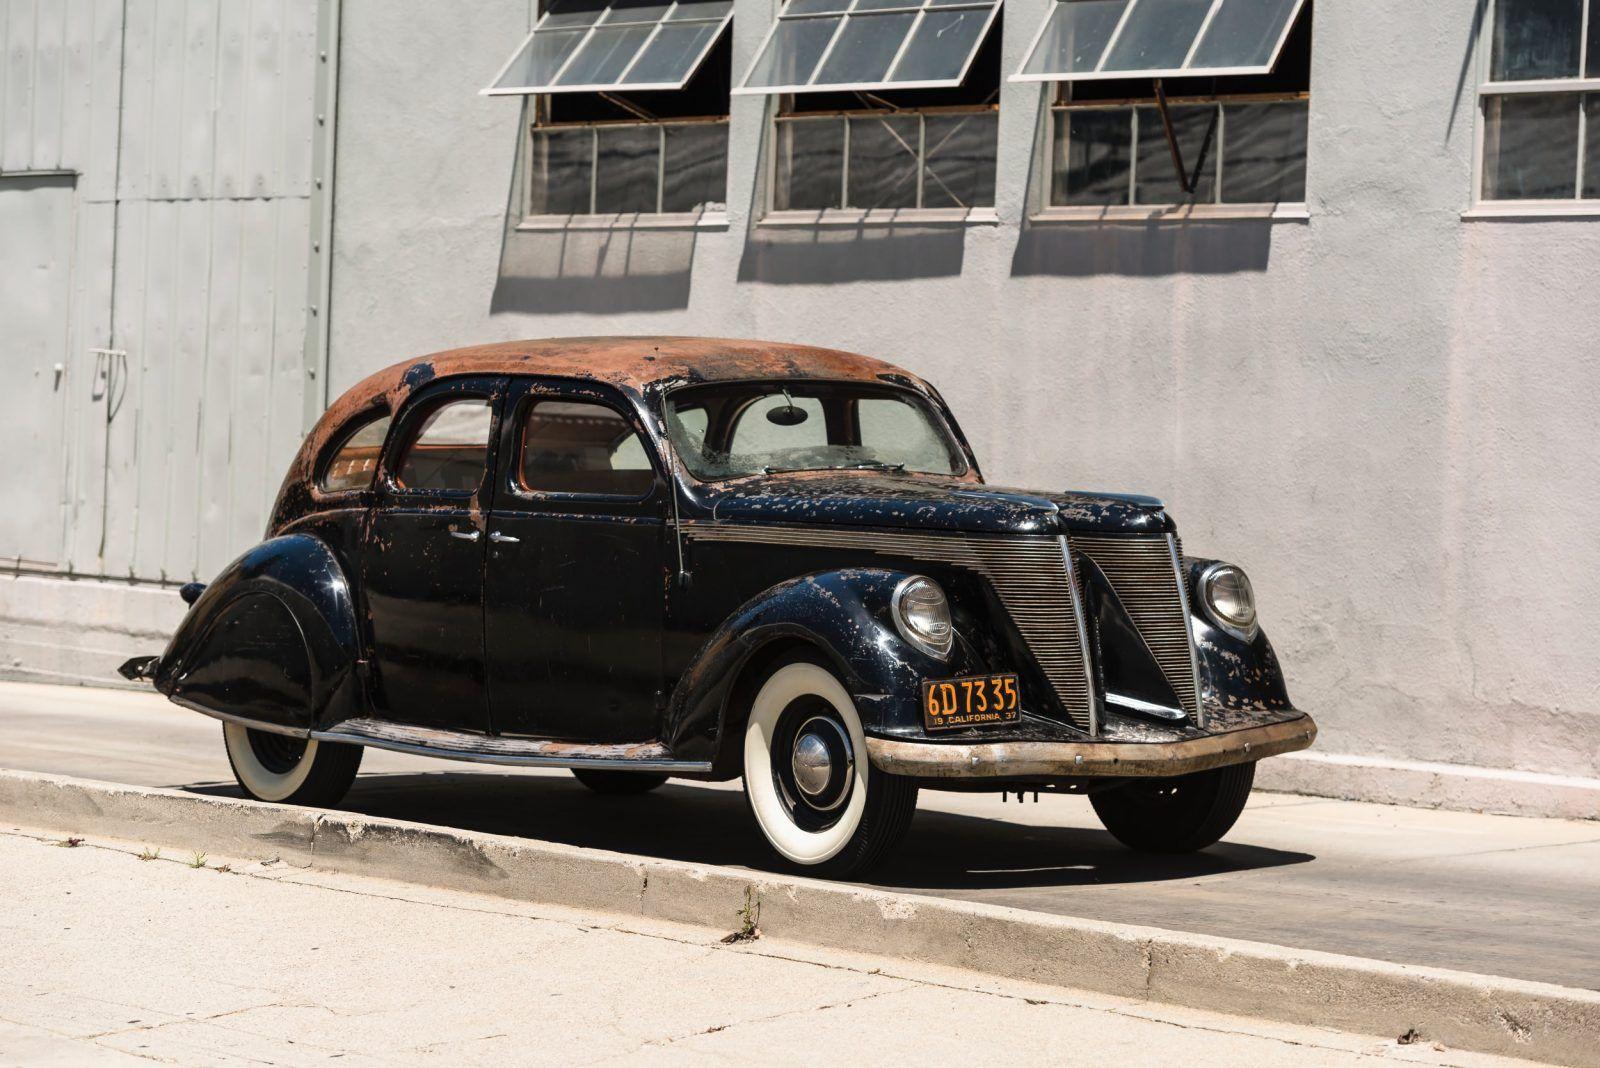 1936 Lincoln Zephyr V12 Twin Grille Lincoln Zephyr Old